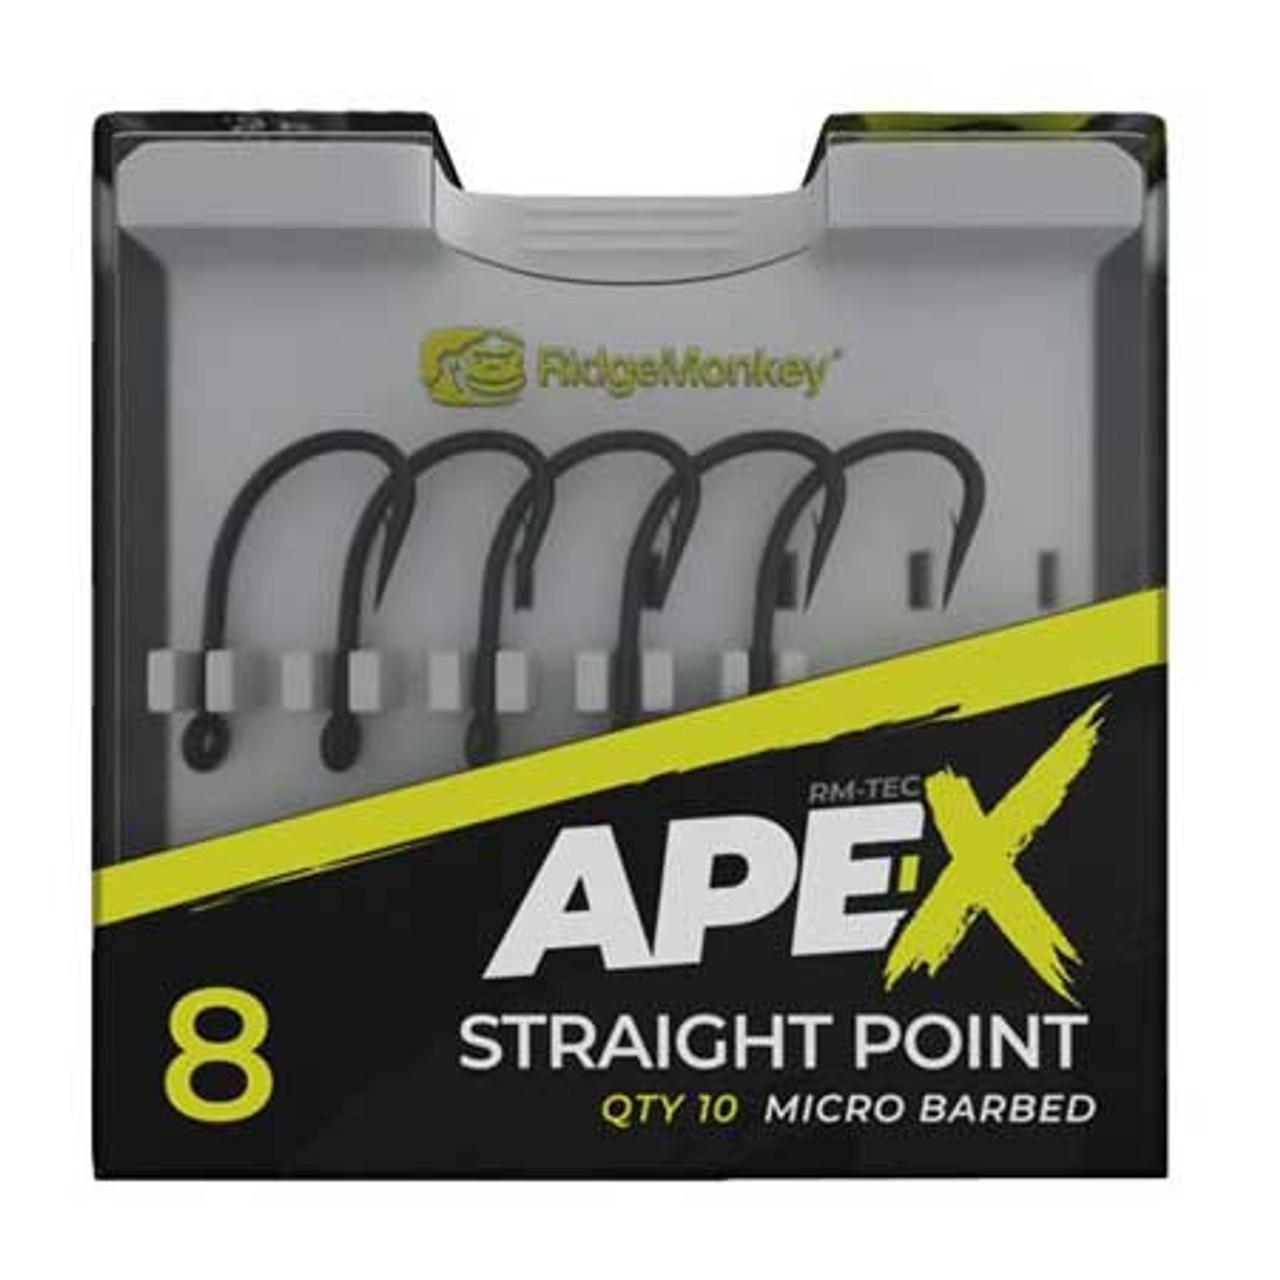 RidgeMonkey Ape-X Straight Point Hooks